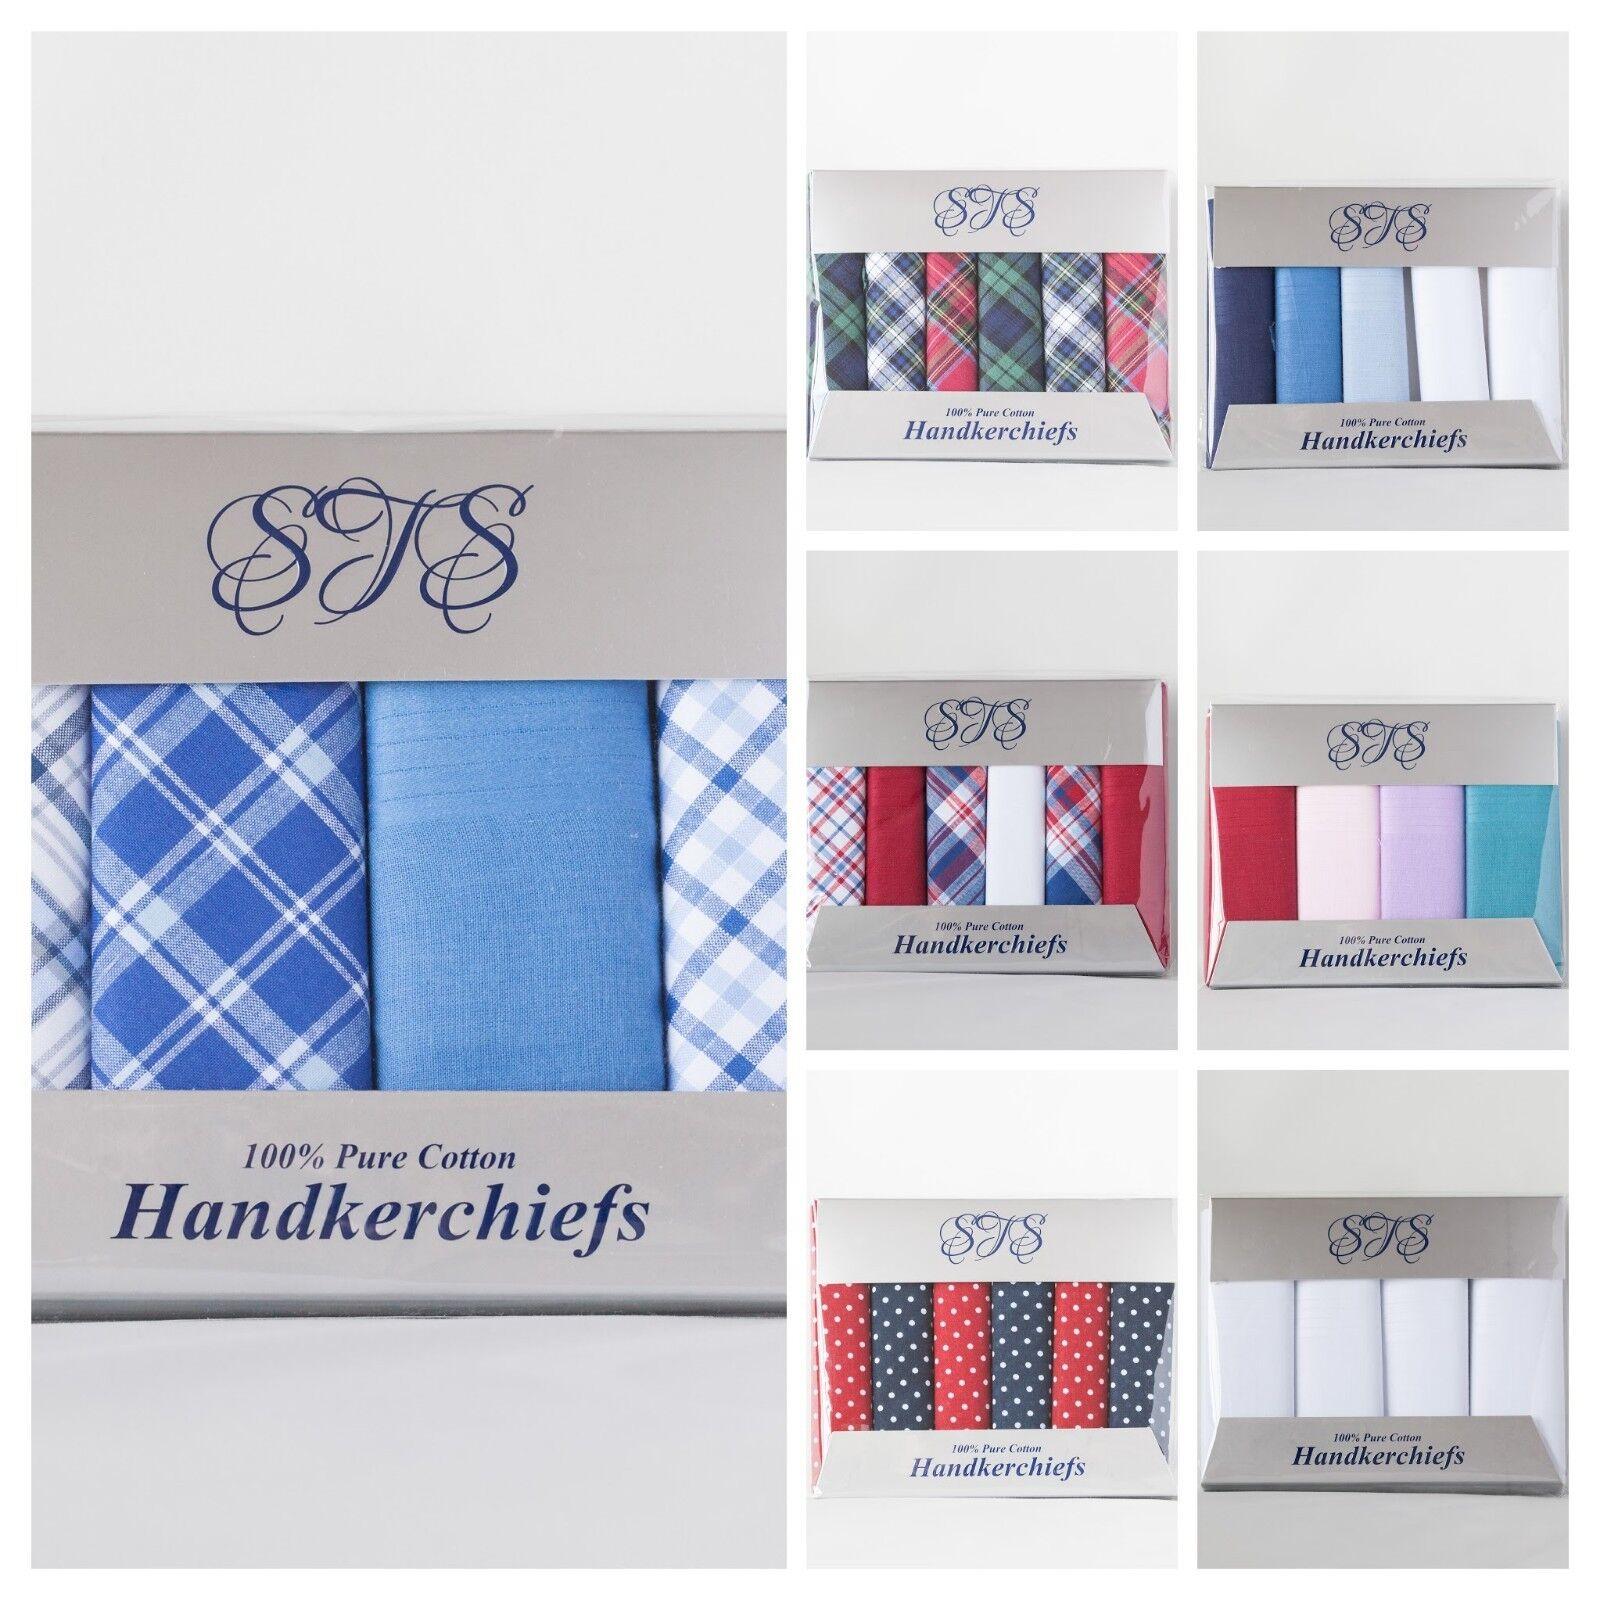 100% COTTON HANDKERCHIEFS HANKIES HANKYS MENS Quality Gift 3/4/5/6/7 Boxed NEW